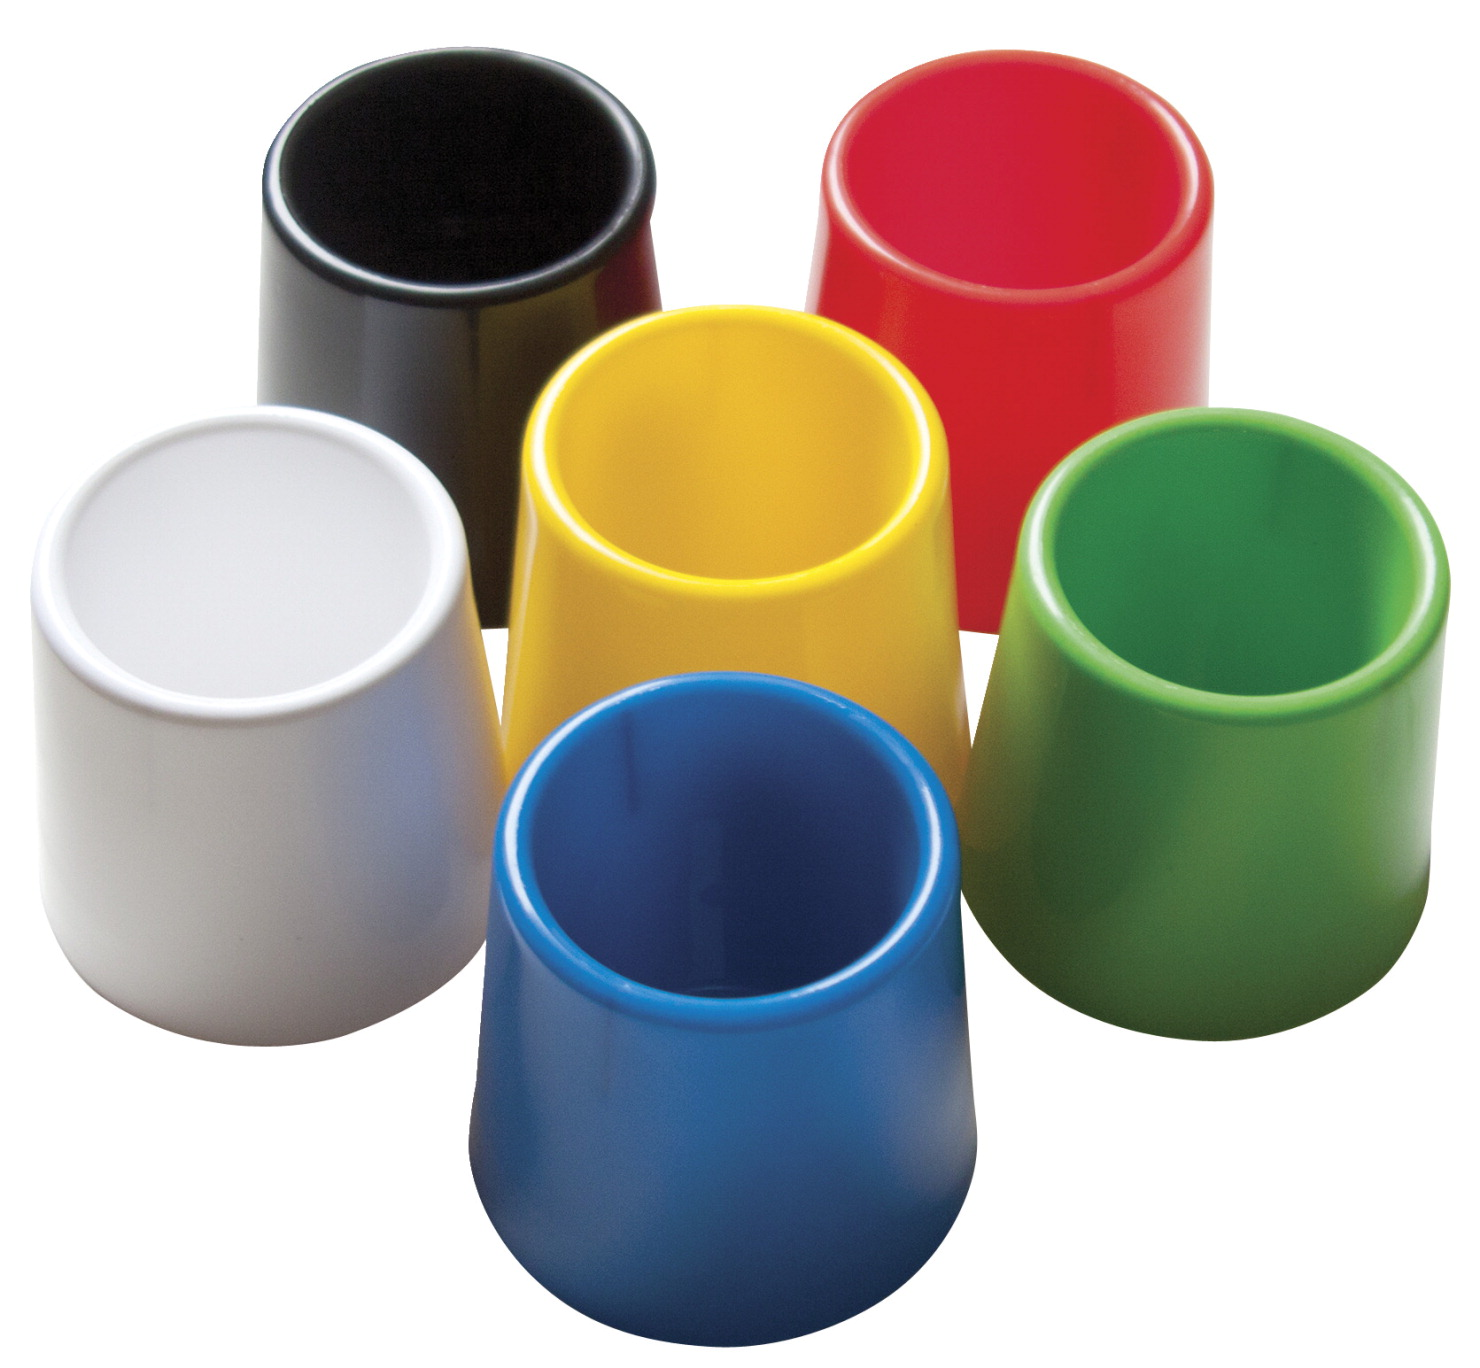 School Smart Plastic Water Pot Set, 4-3/4 x 3-1/2 Inches, Assorted Color, Set of 6